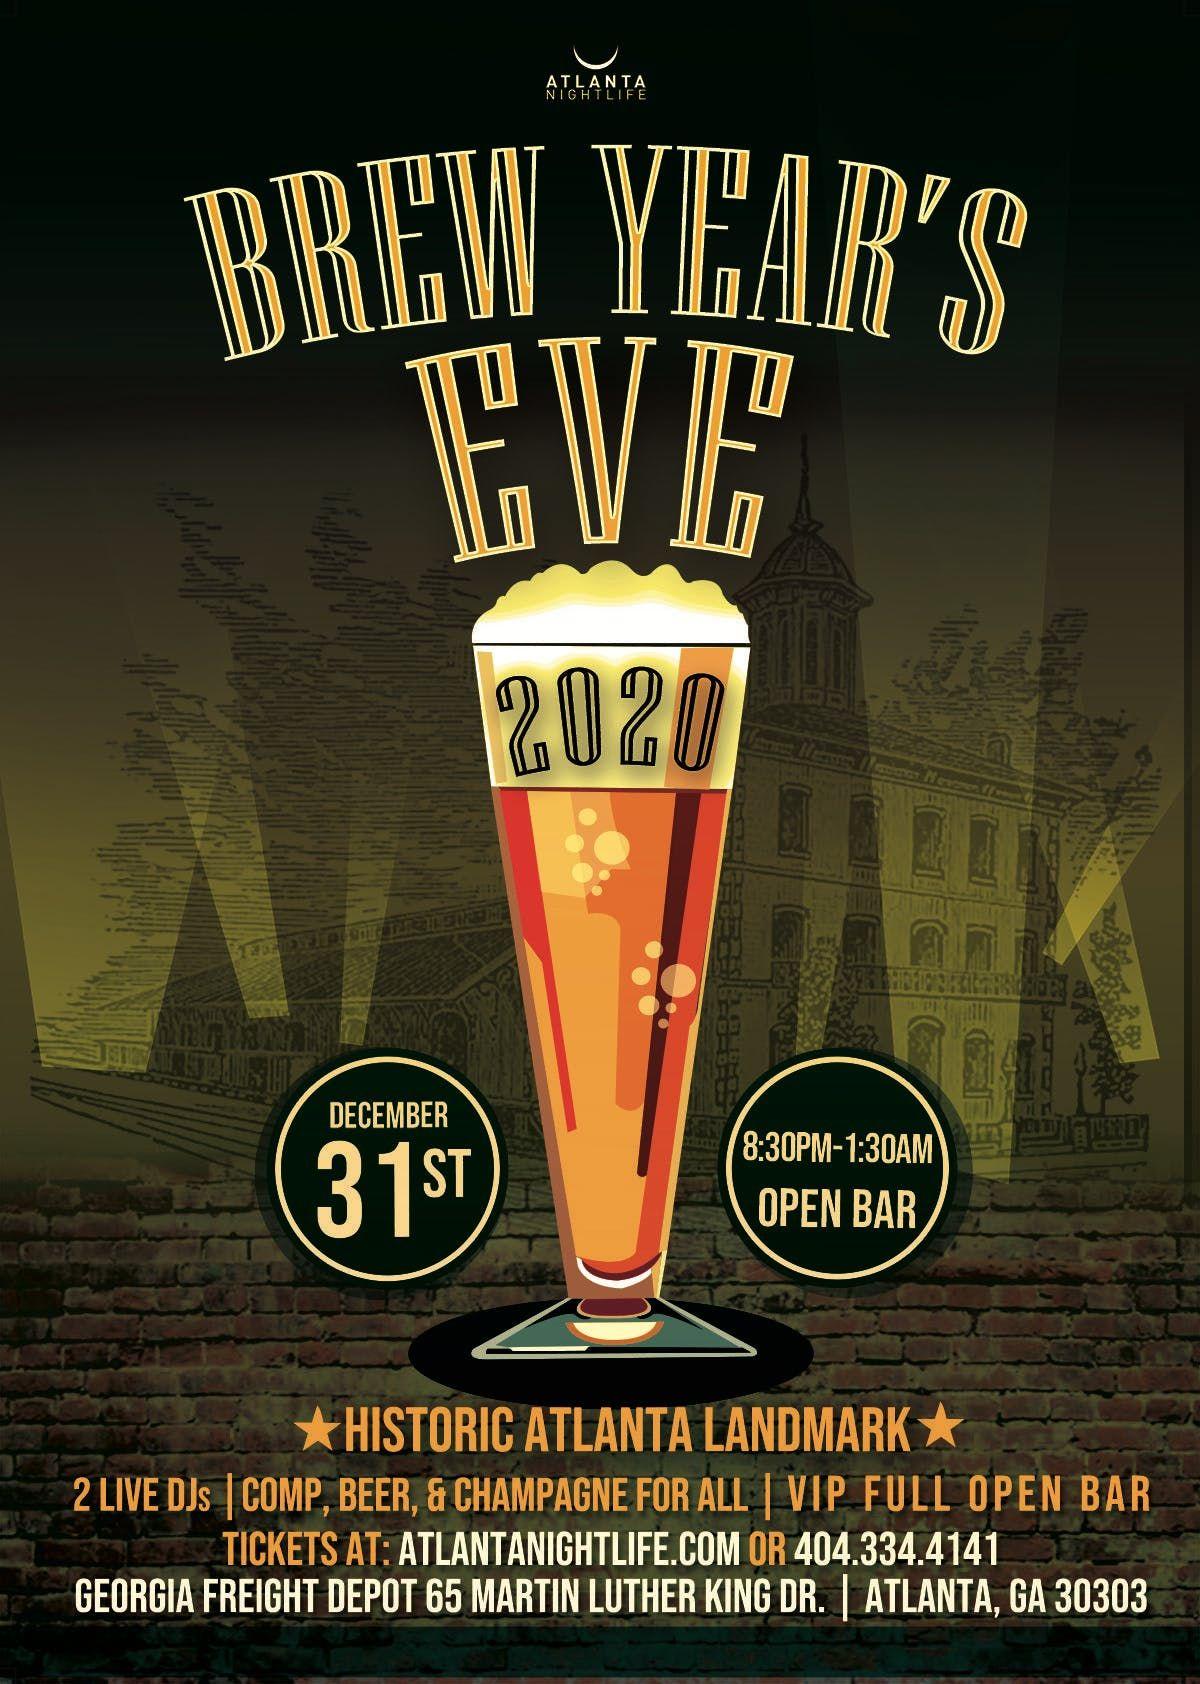 Atlanta New Years Eve 2020 Atlanta Brew Years Eve 2020 at Georgia Freight Depot, Atlanta